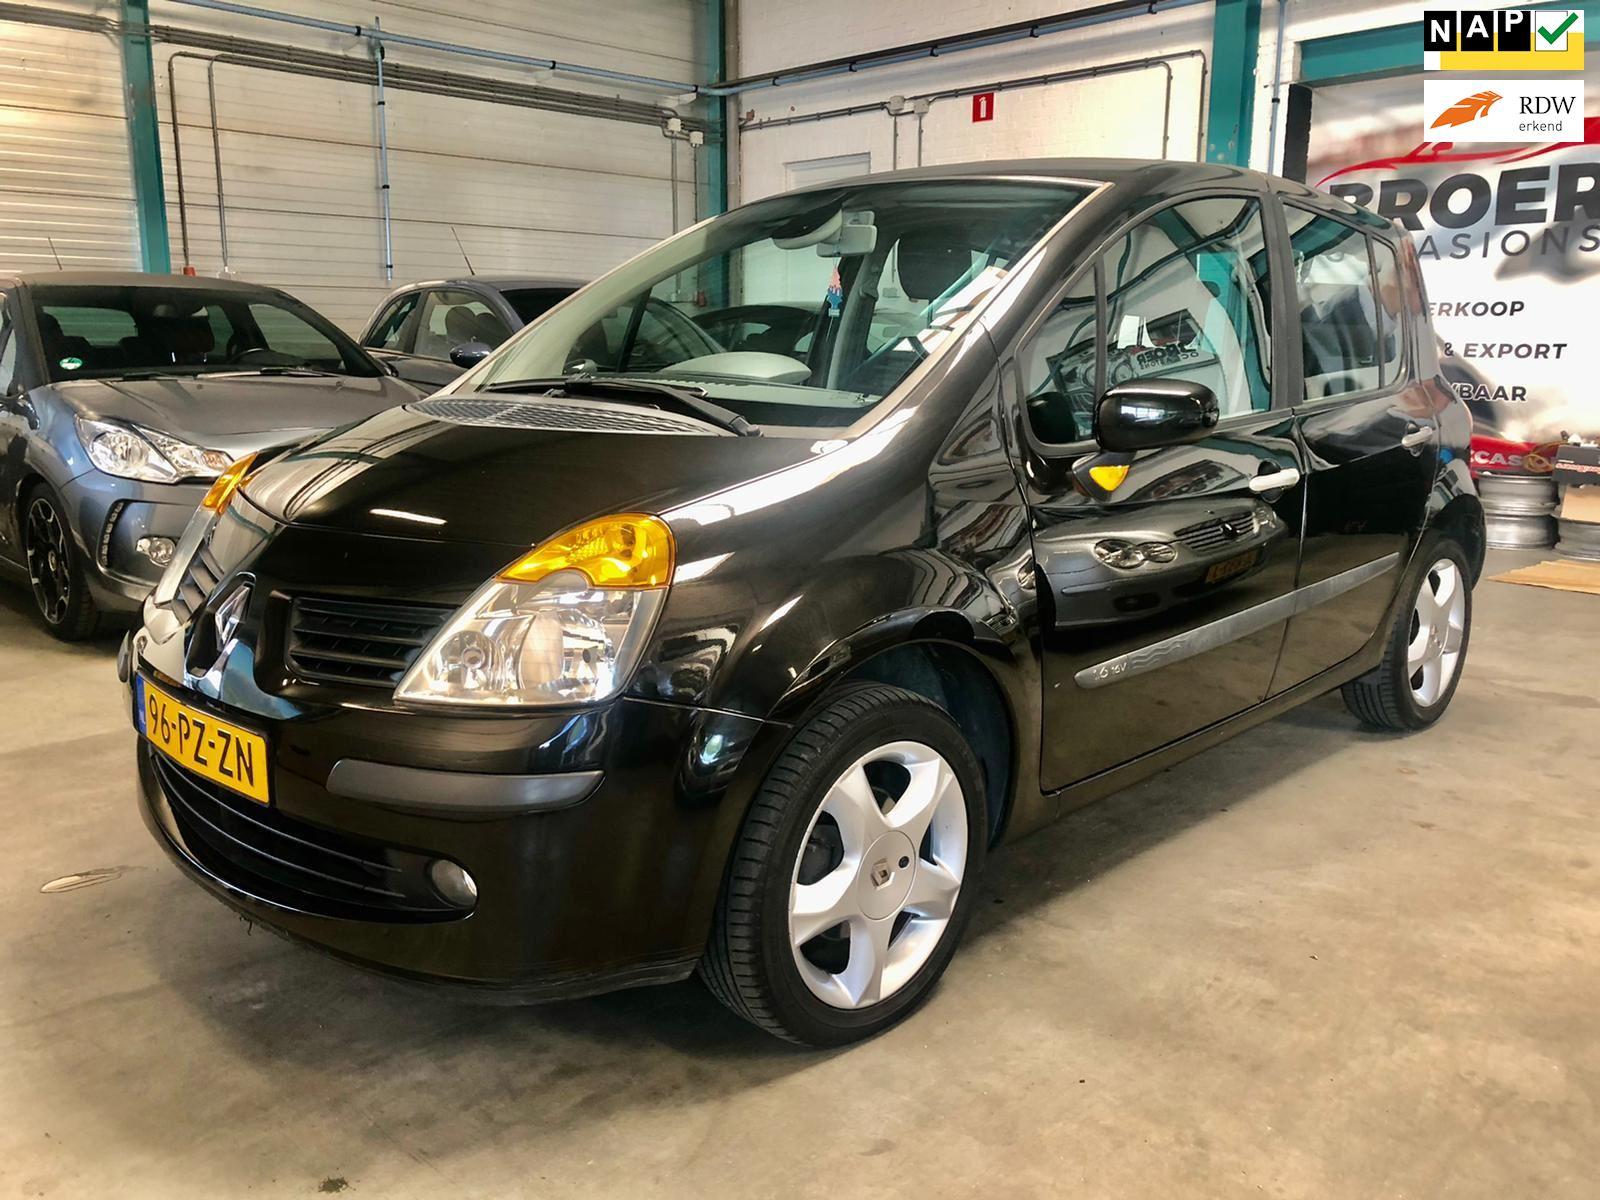 Renault Modus occasion - Broer Autohandel